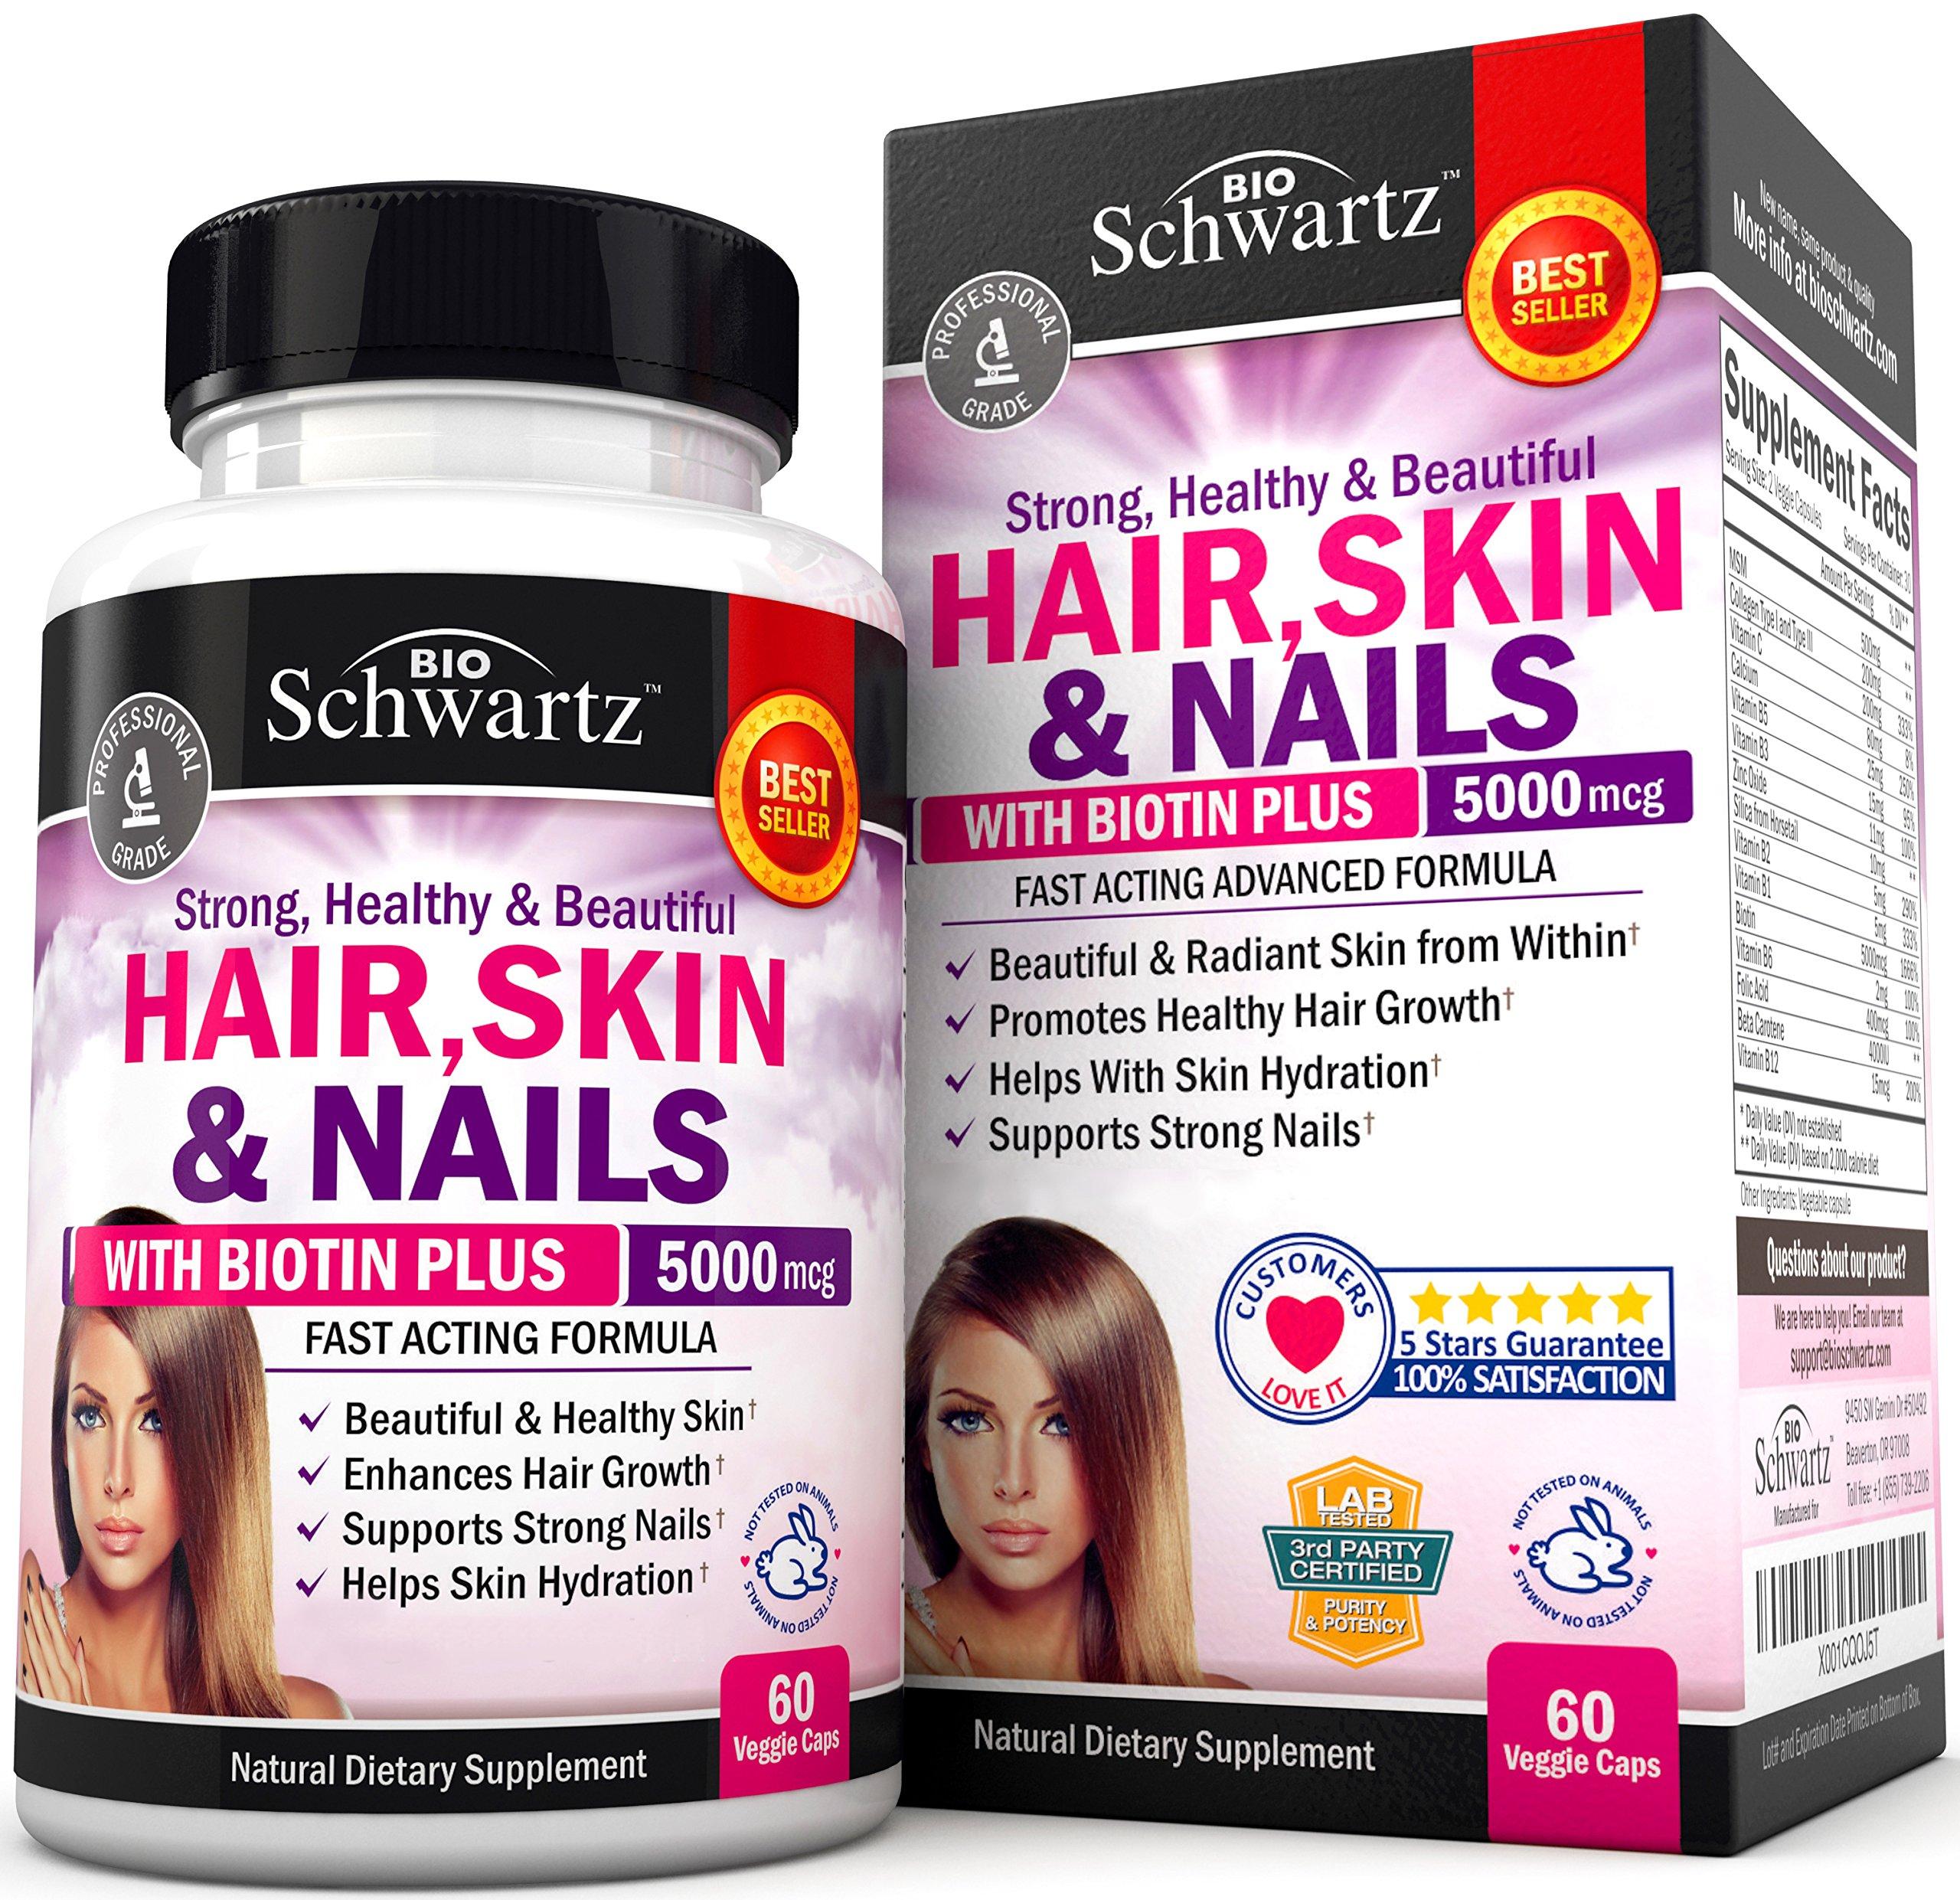 Hair Skin and Nails Vitamin with Biotin 5000. Promotes Hair Growth Glowing Skin Strong Nails. Natural & Non-GMO. Good as Phytoceramides 350 mg Anti-Aging Skin Care. Made in USA Money Back Guarantee